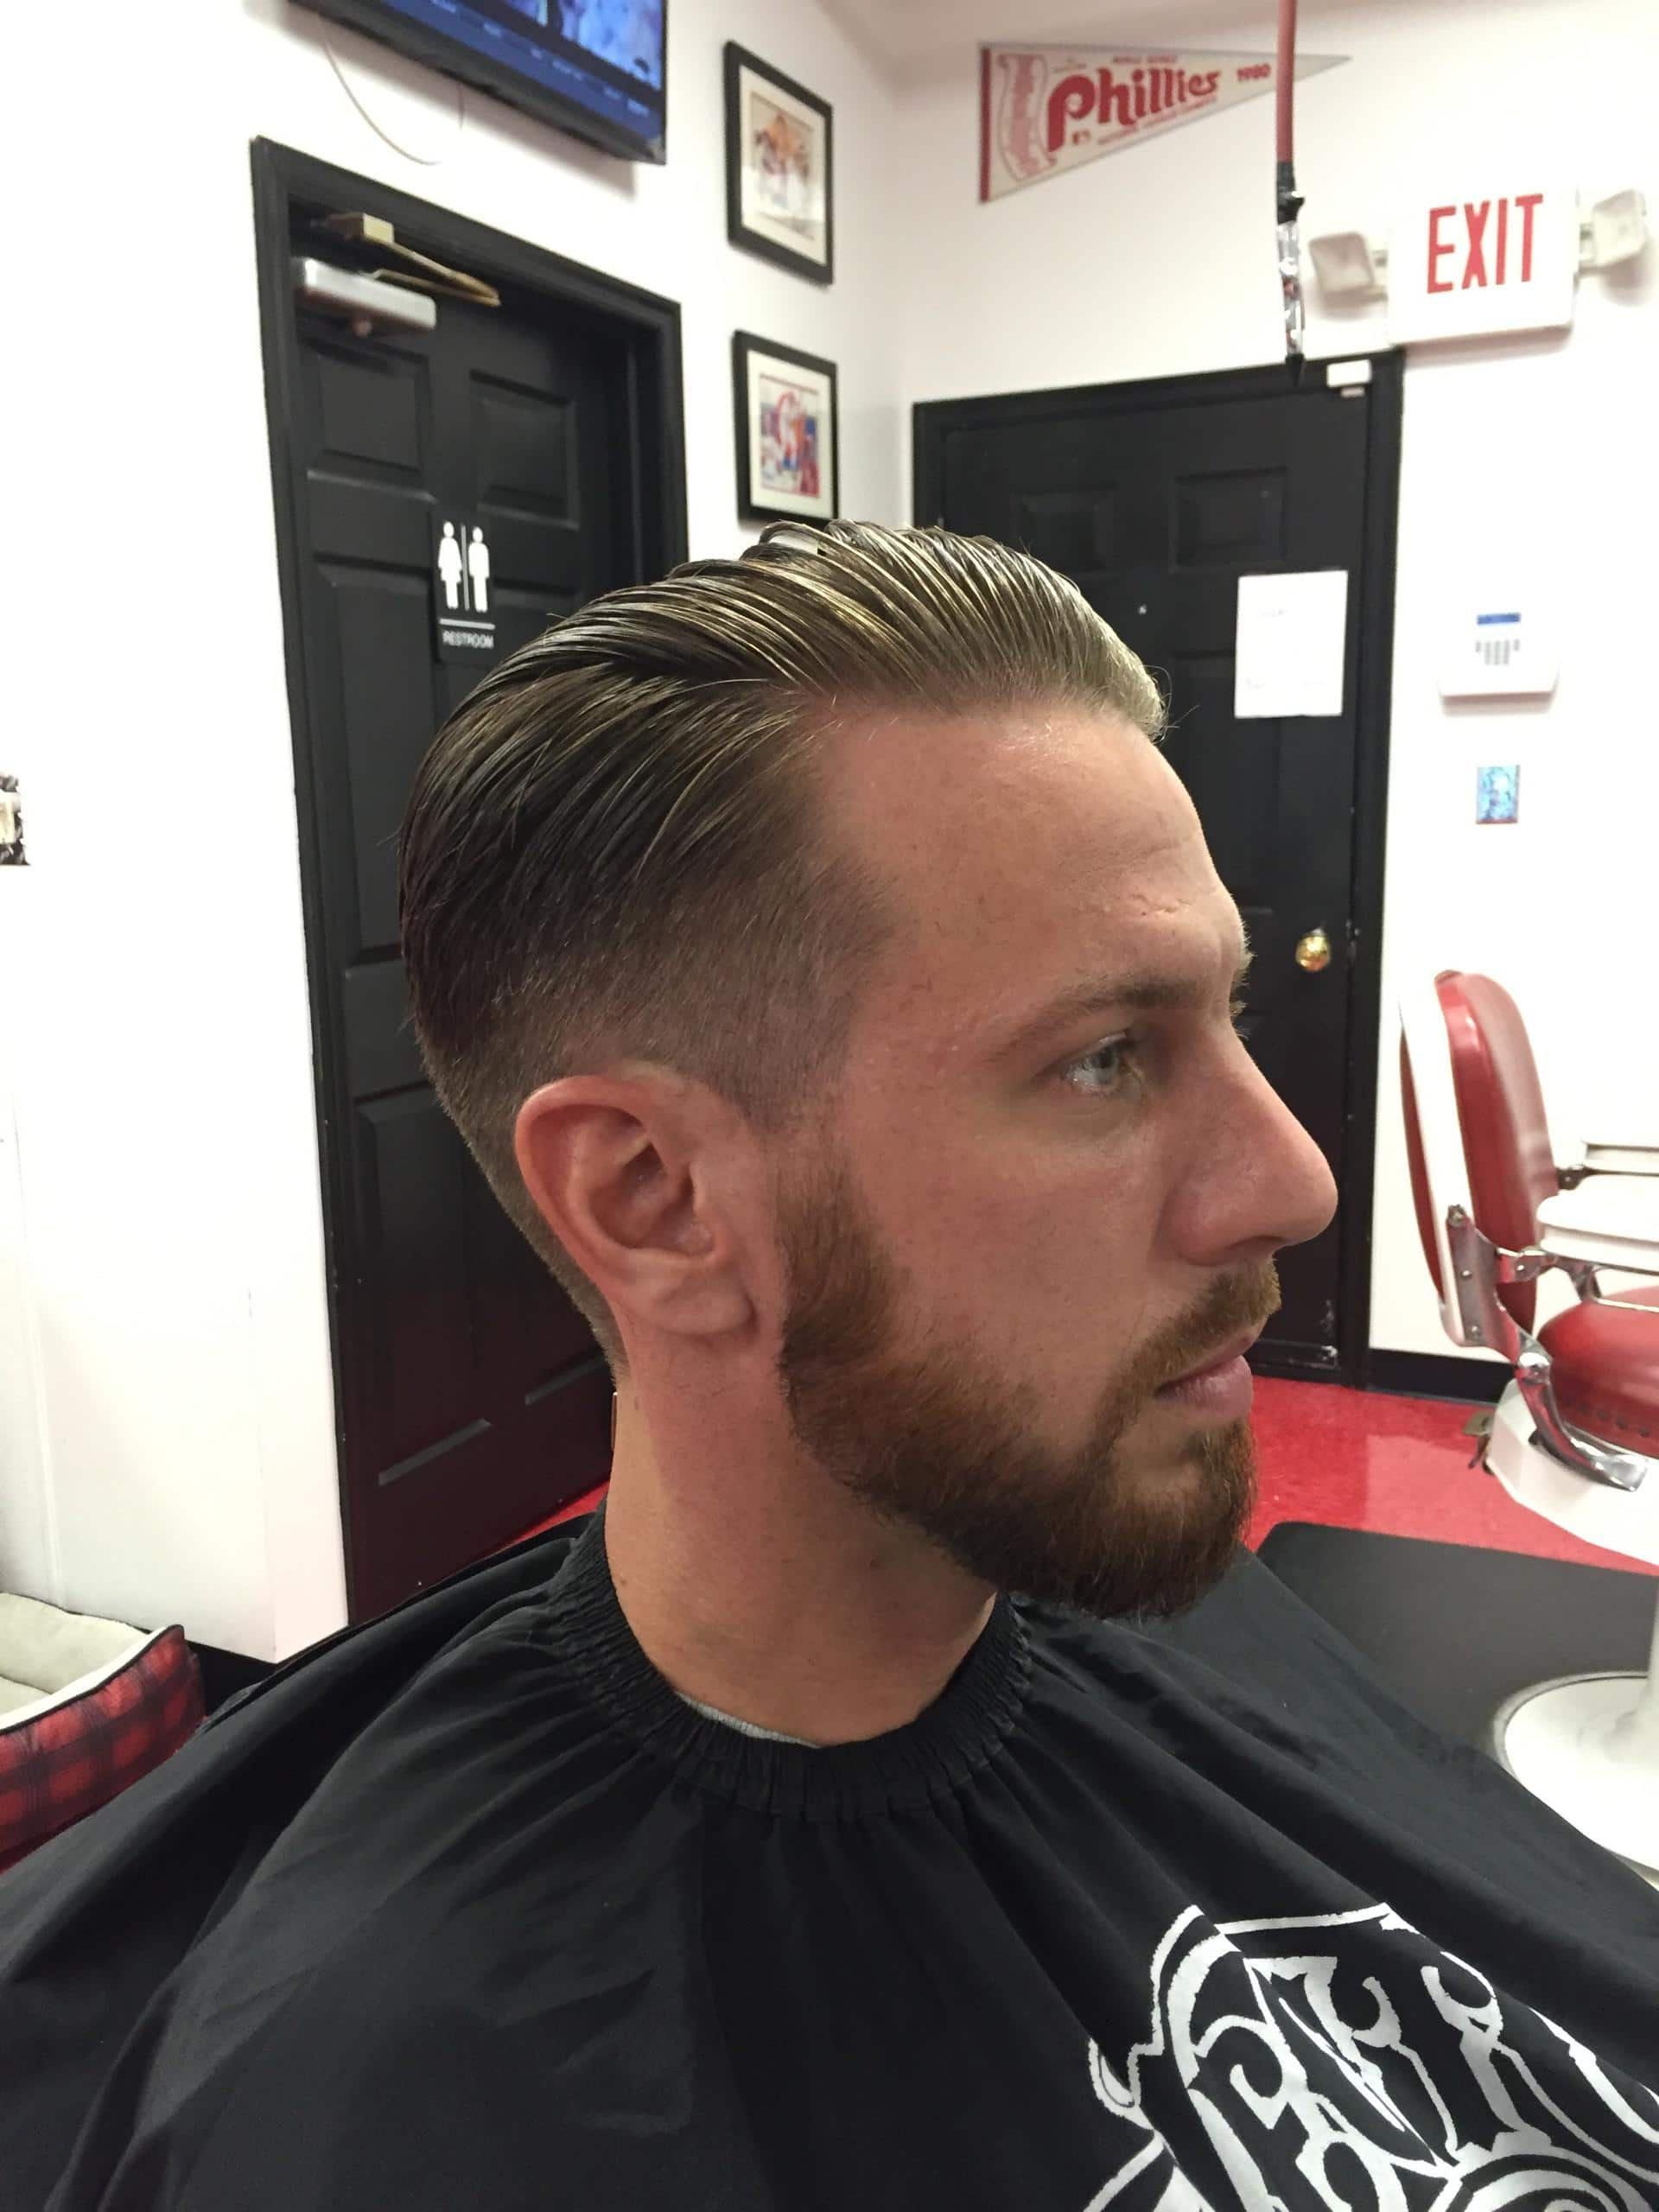 Gentlemens Hair Cuts Cruisin Style Barber Parlor